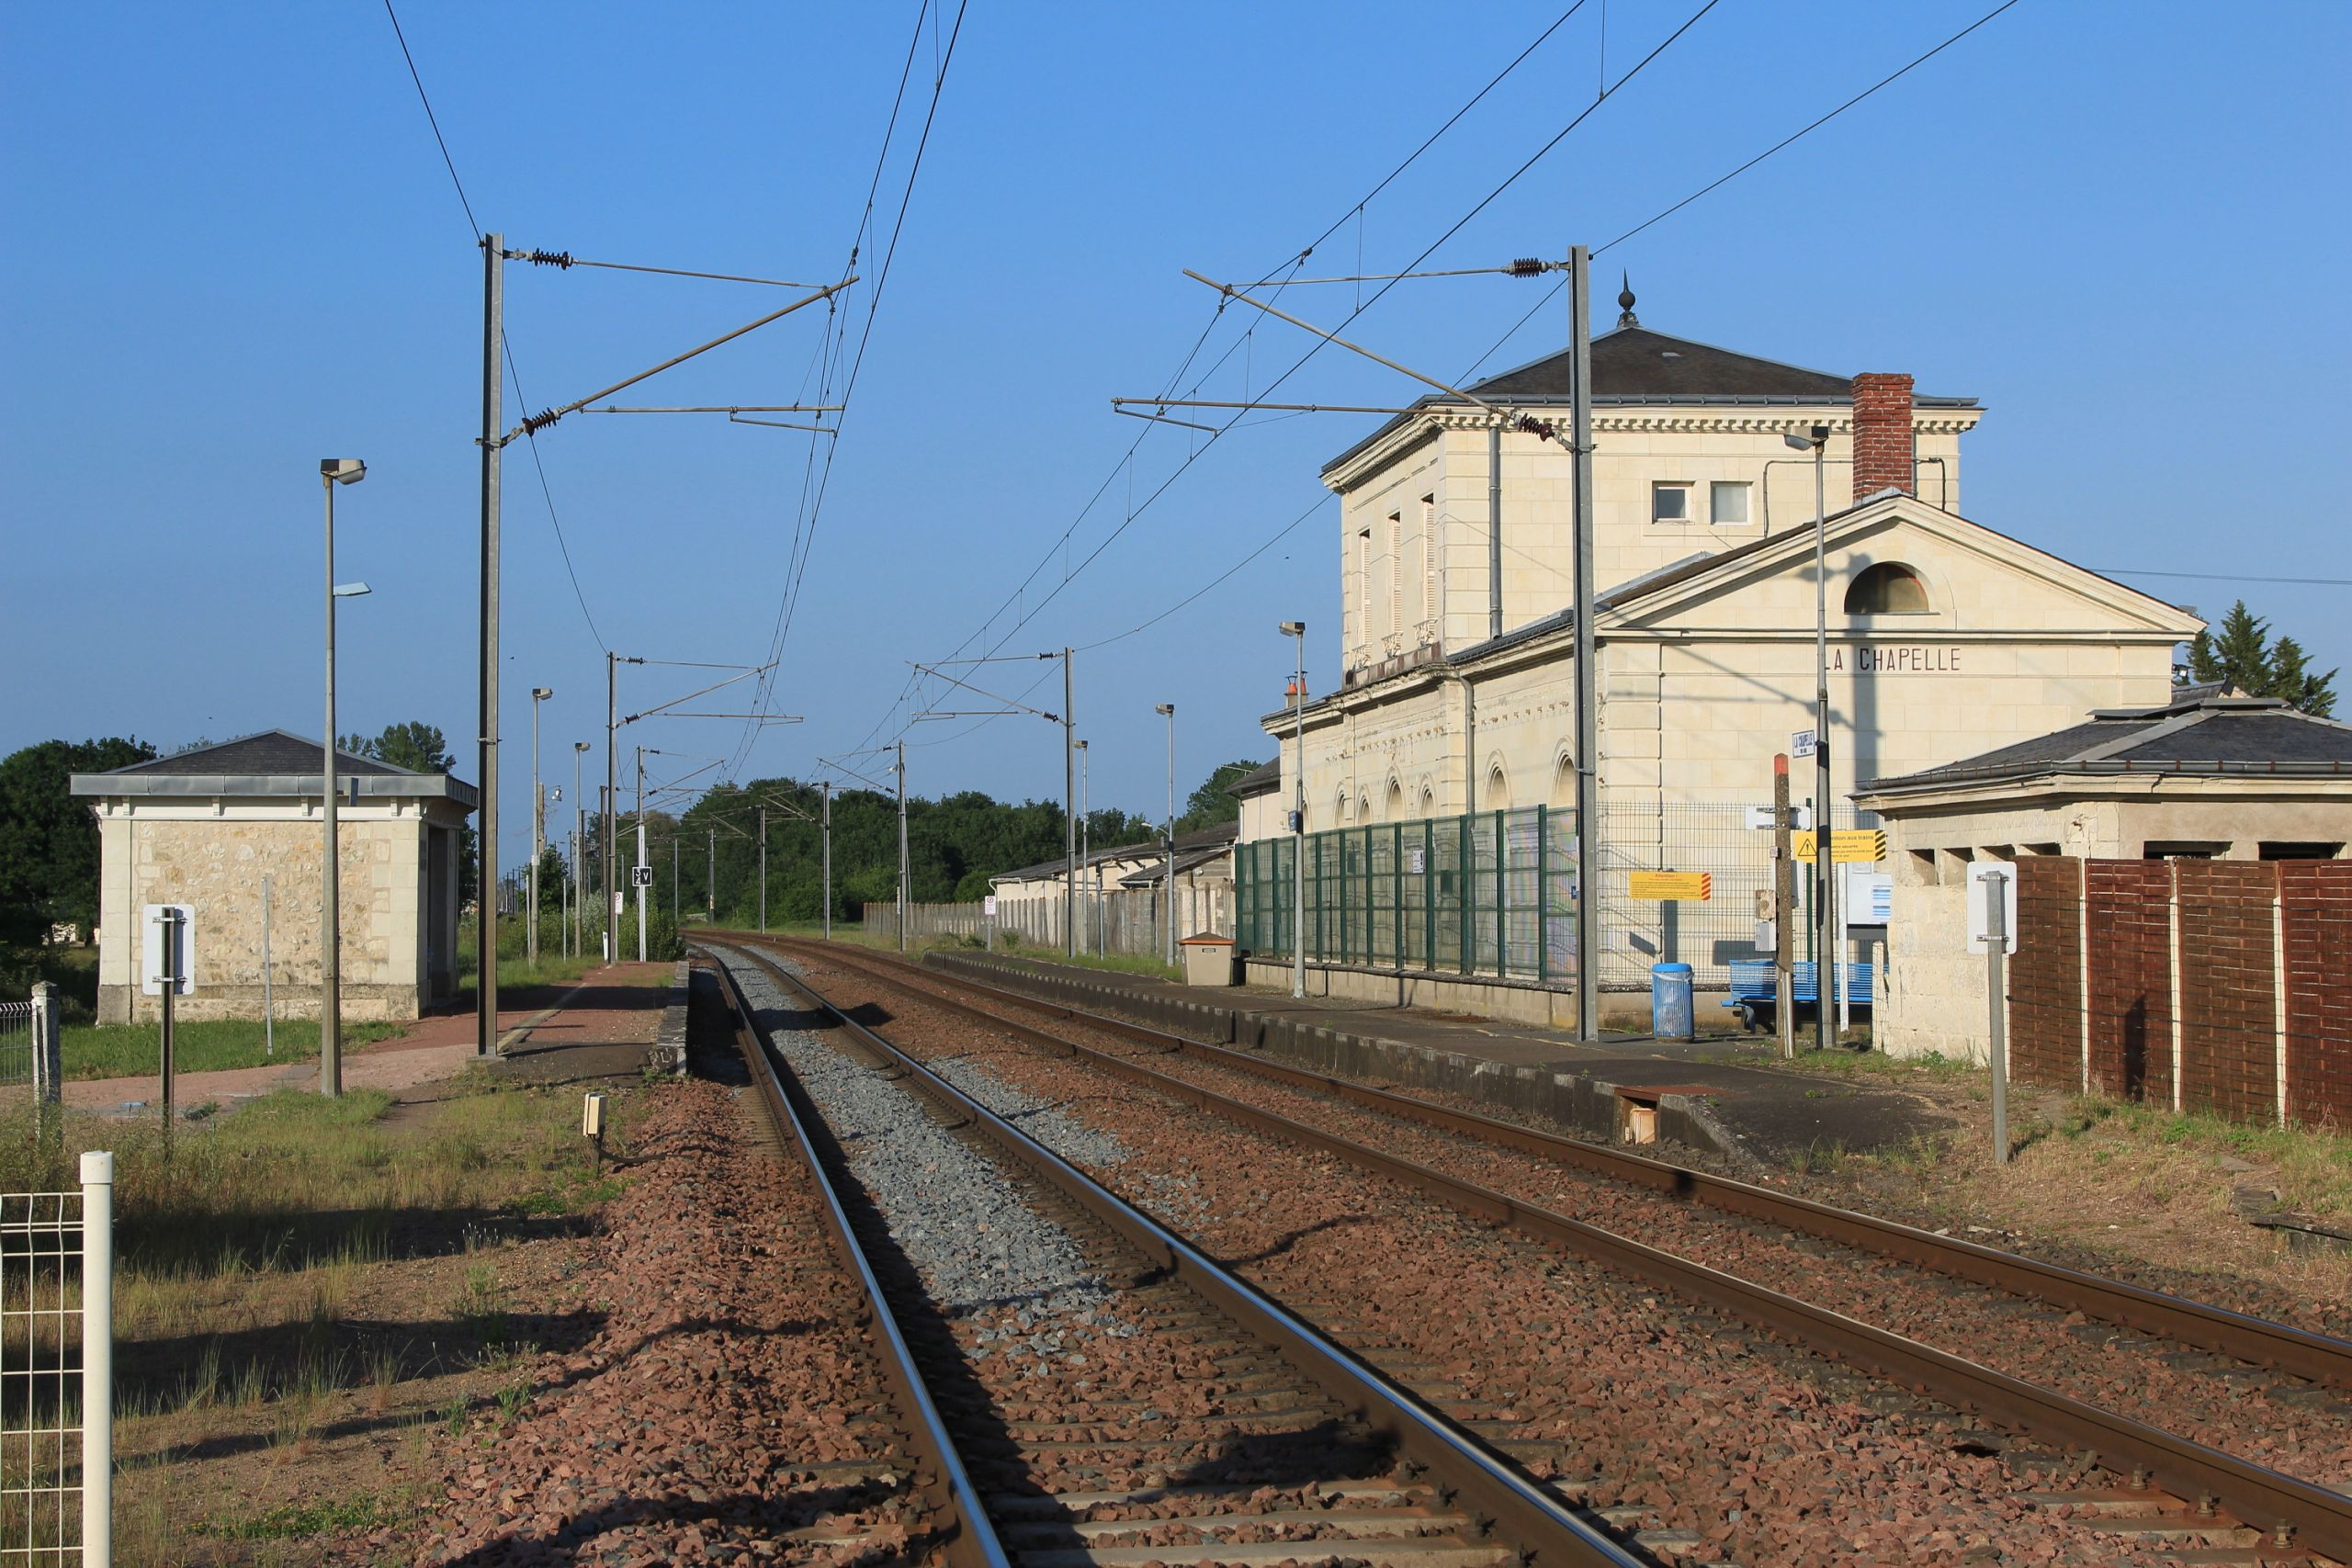 Gare de La Chapelle sur Loire 3 par Cramos JPG